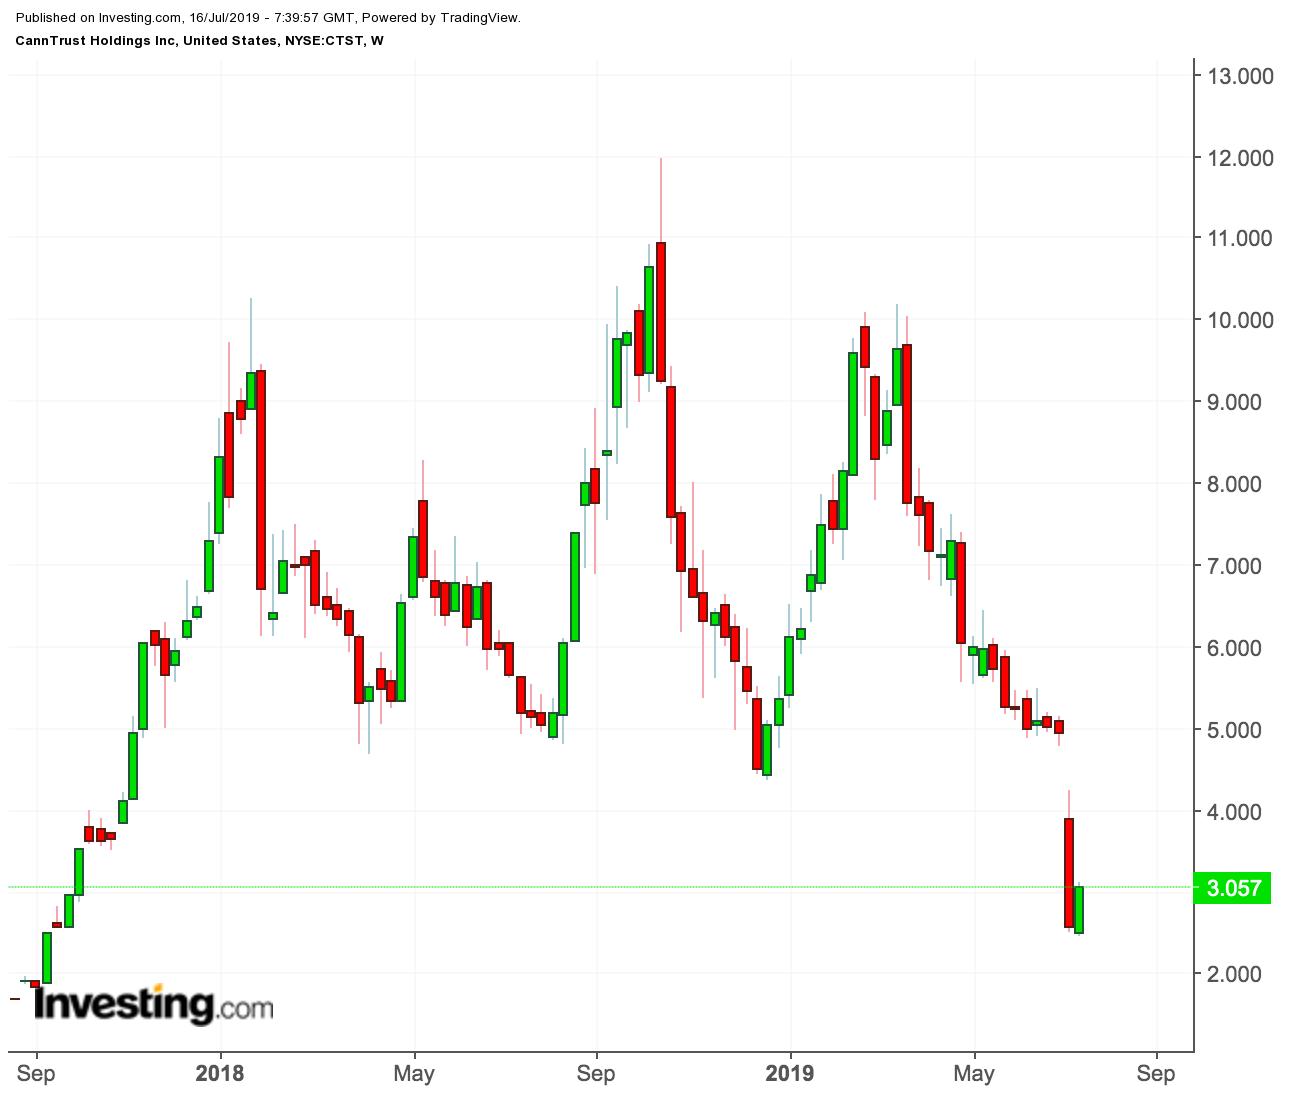 CannTrust Holdings price chart